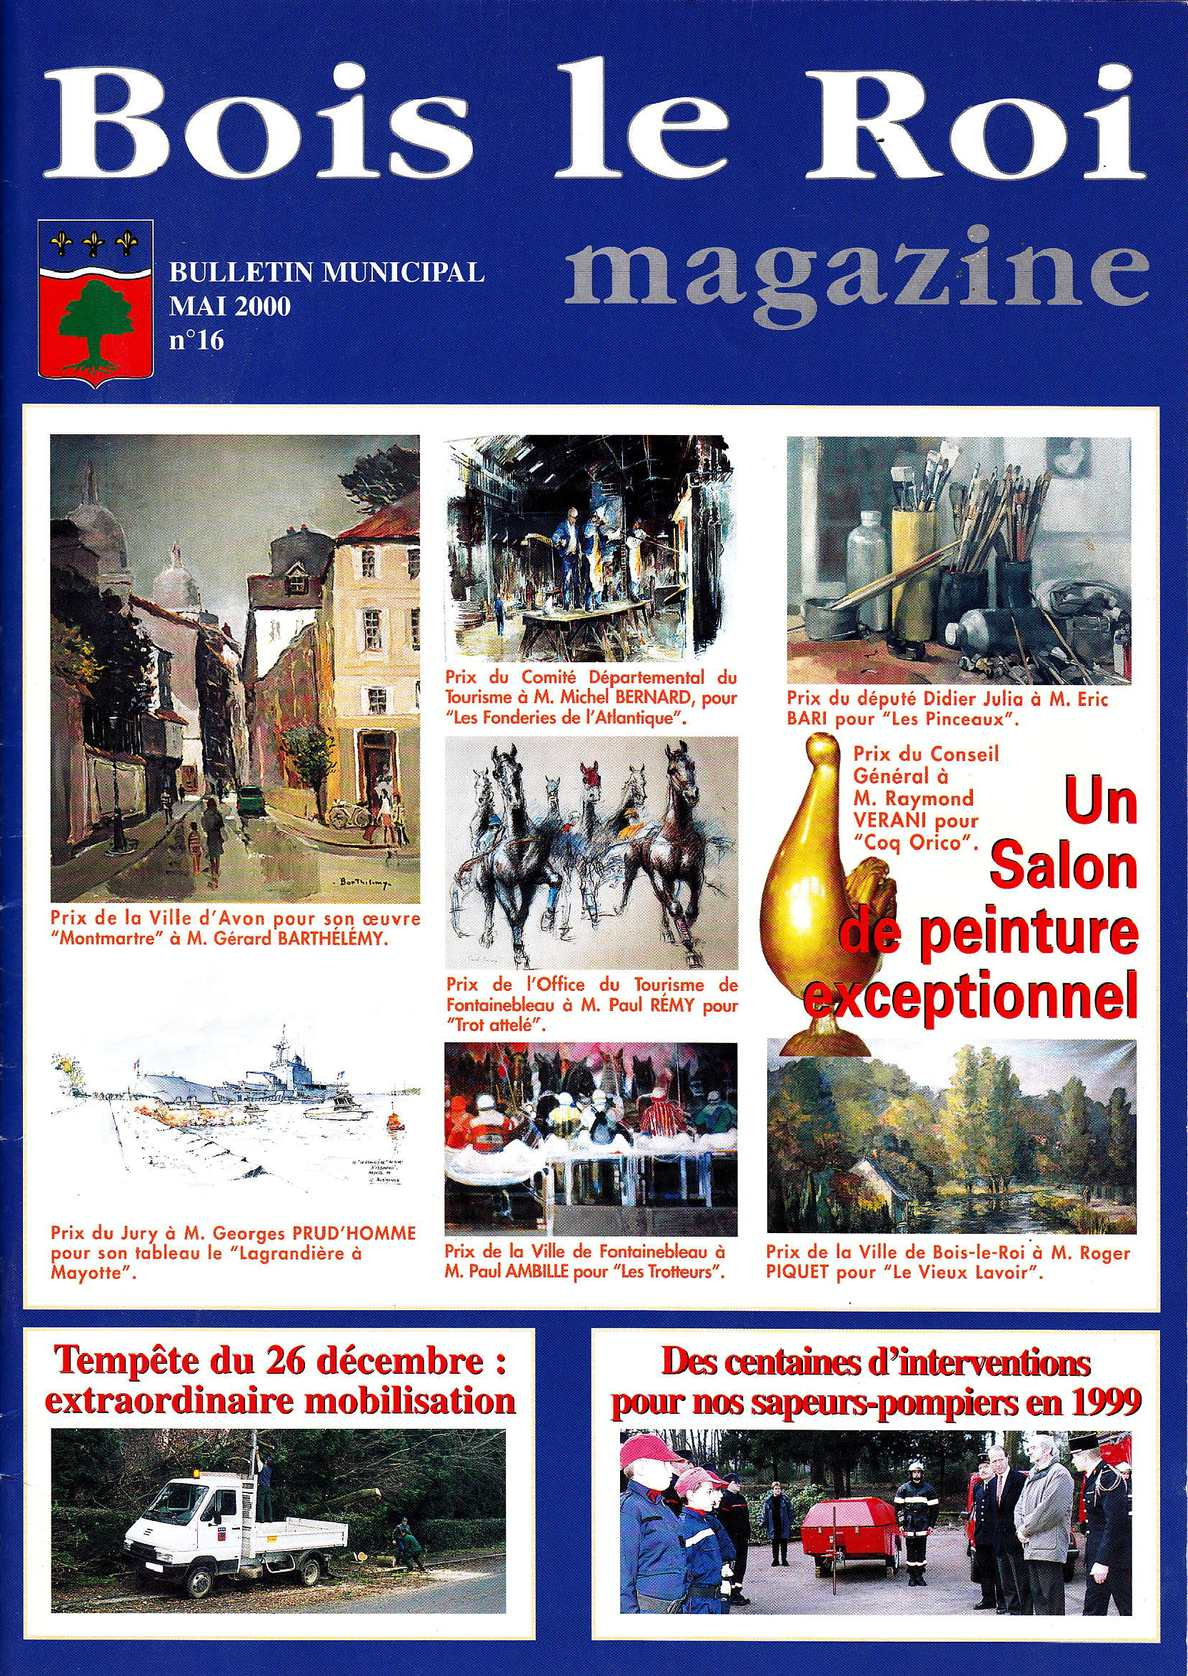 Calaméo Bois le roi Magazine 2000 # Triathlon Bois Le Roi